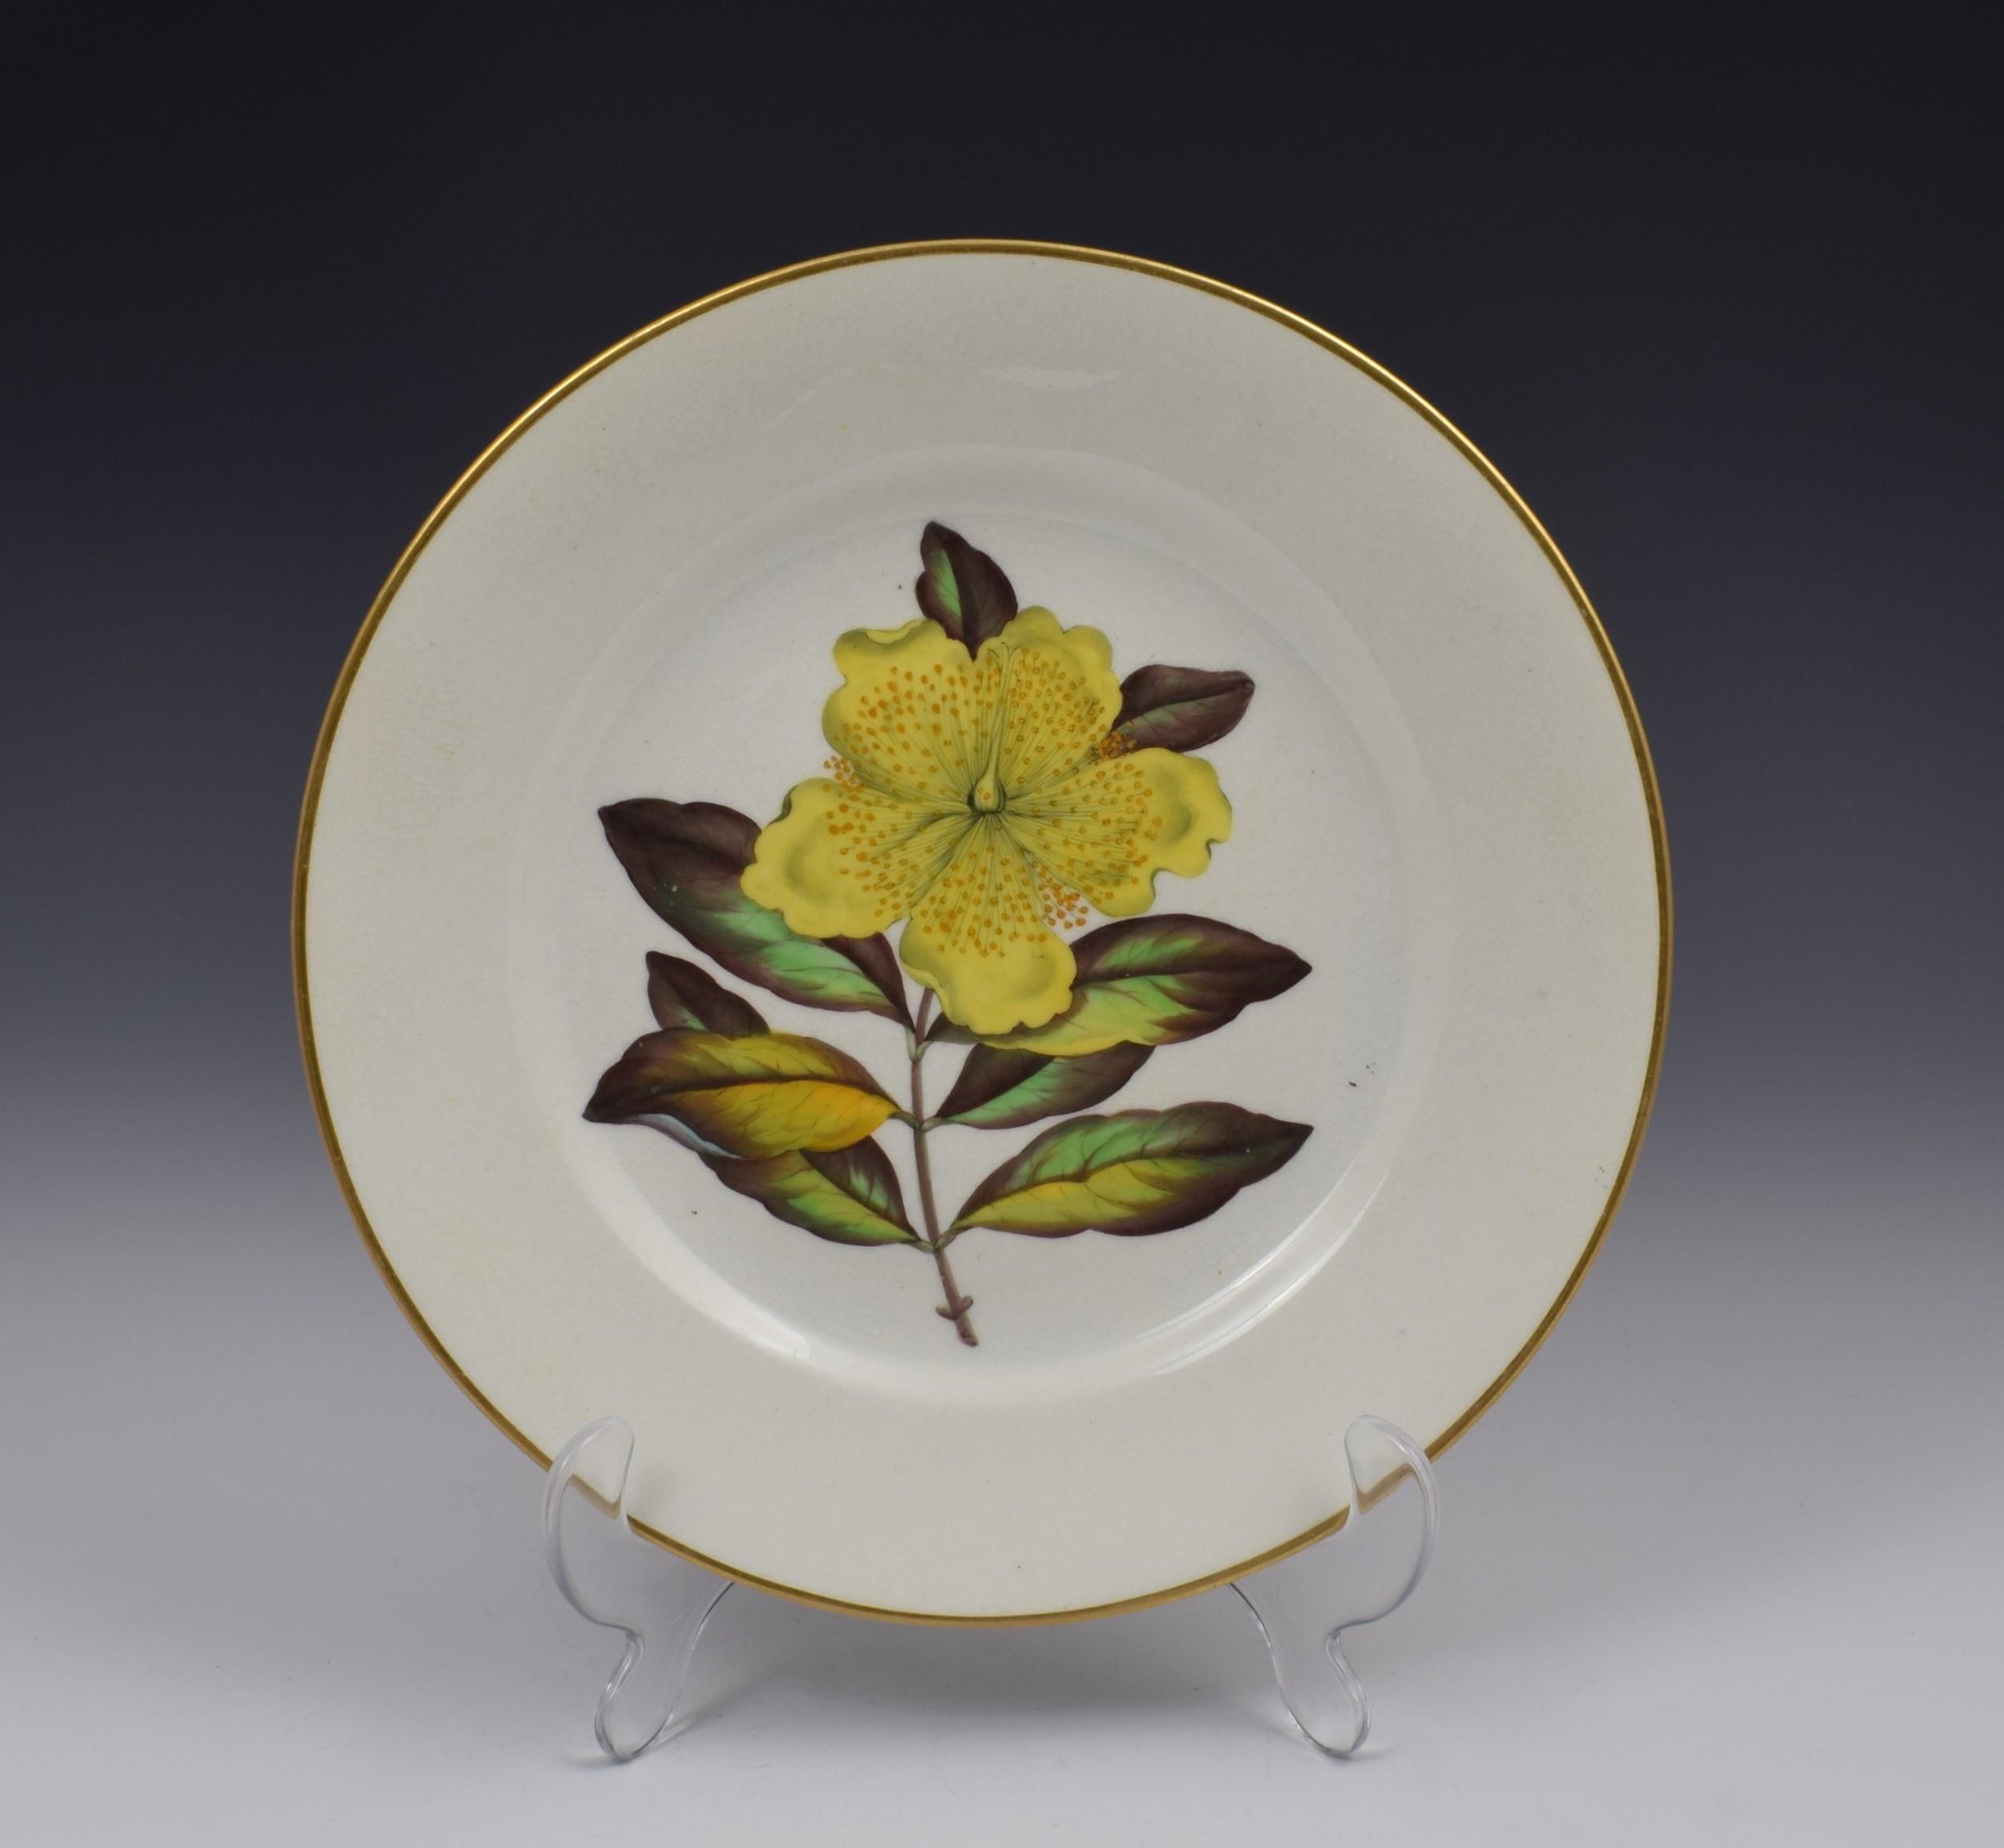 derby porcelain botanical dessert plate c1806 curtis st john's wort